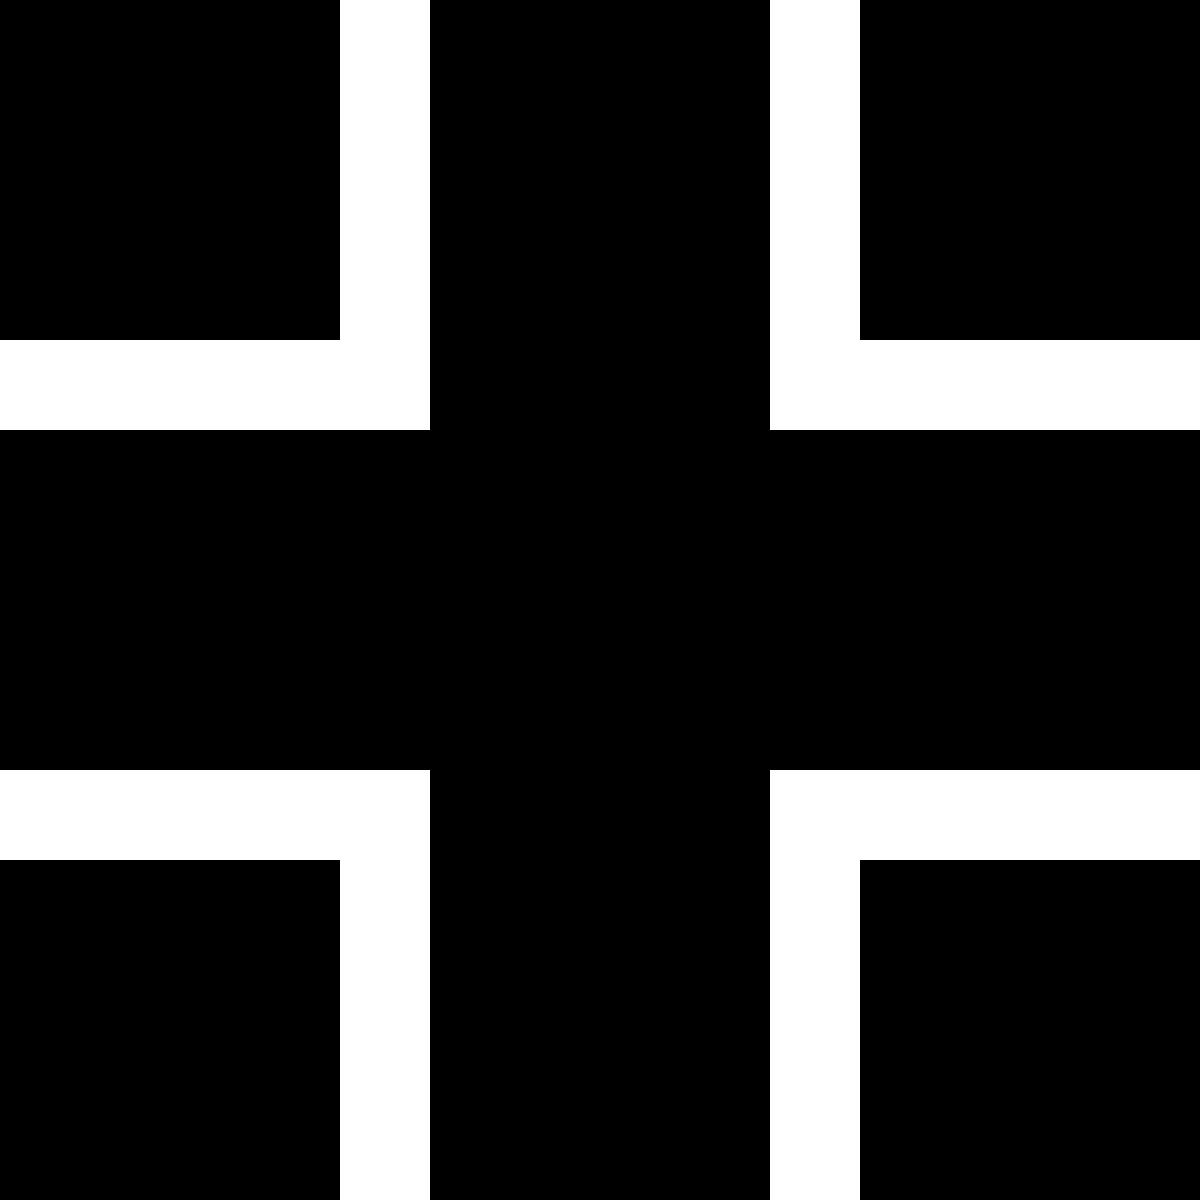 Les rapports du front - Wehrmacht V0SRJMQfIhKVu2ClPjre54n3fYPkJc92LKK22ap0EzDxVHPI5KIjYxdvf7QLv9yDo4UhcPBjWQnzyaIaPPHzHyprr8358kohgGfbqdEjAKyvMBO_W3OlQ_dz2tImFBFlIOd-I9Un